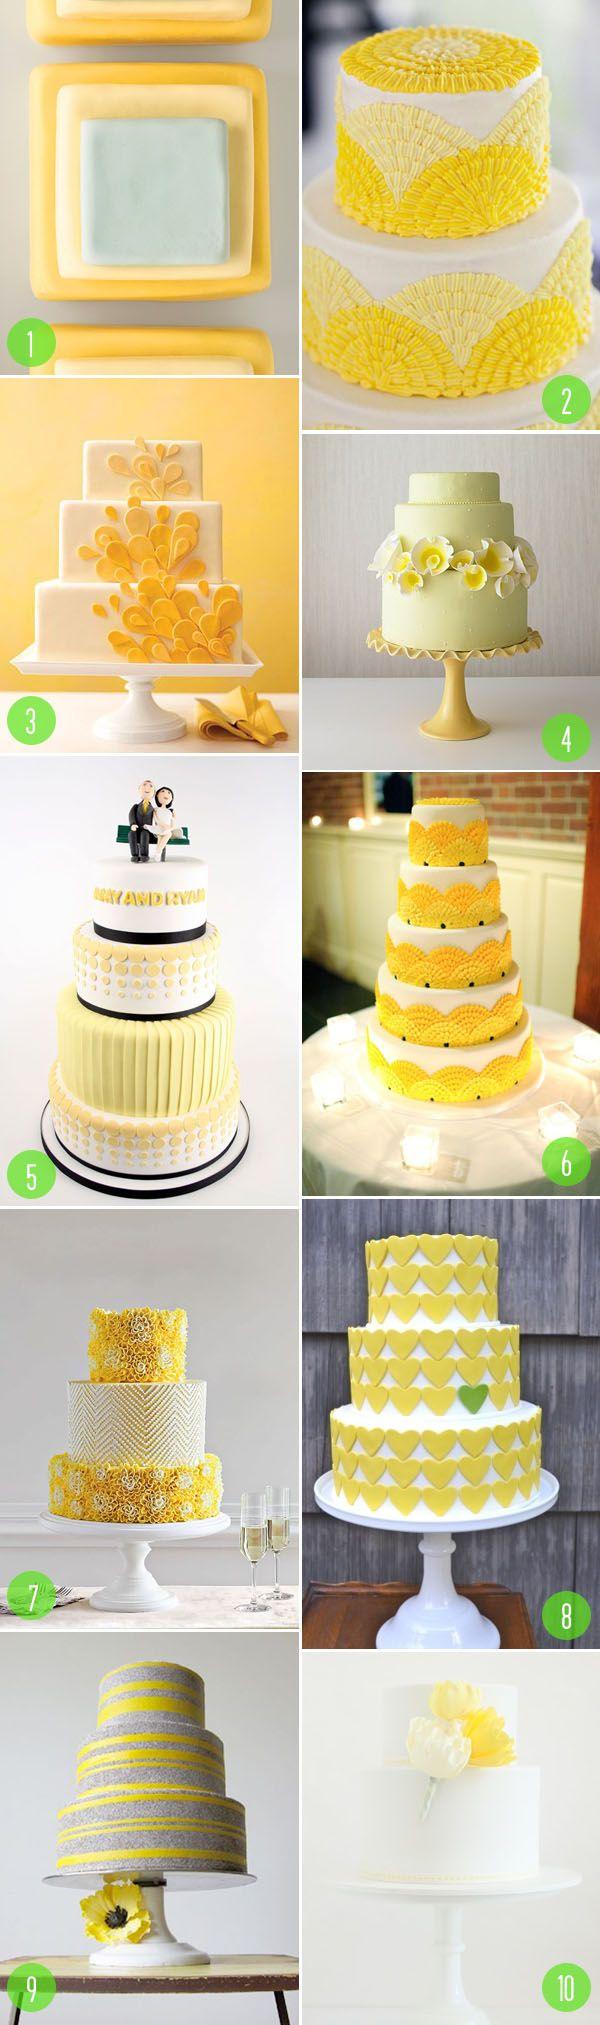 28 best Wendding images on Pinterest   Wedding inspiration ...